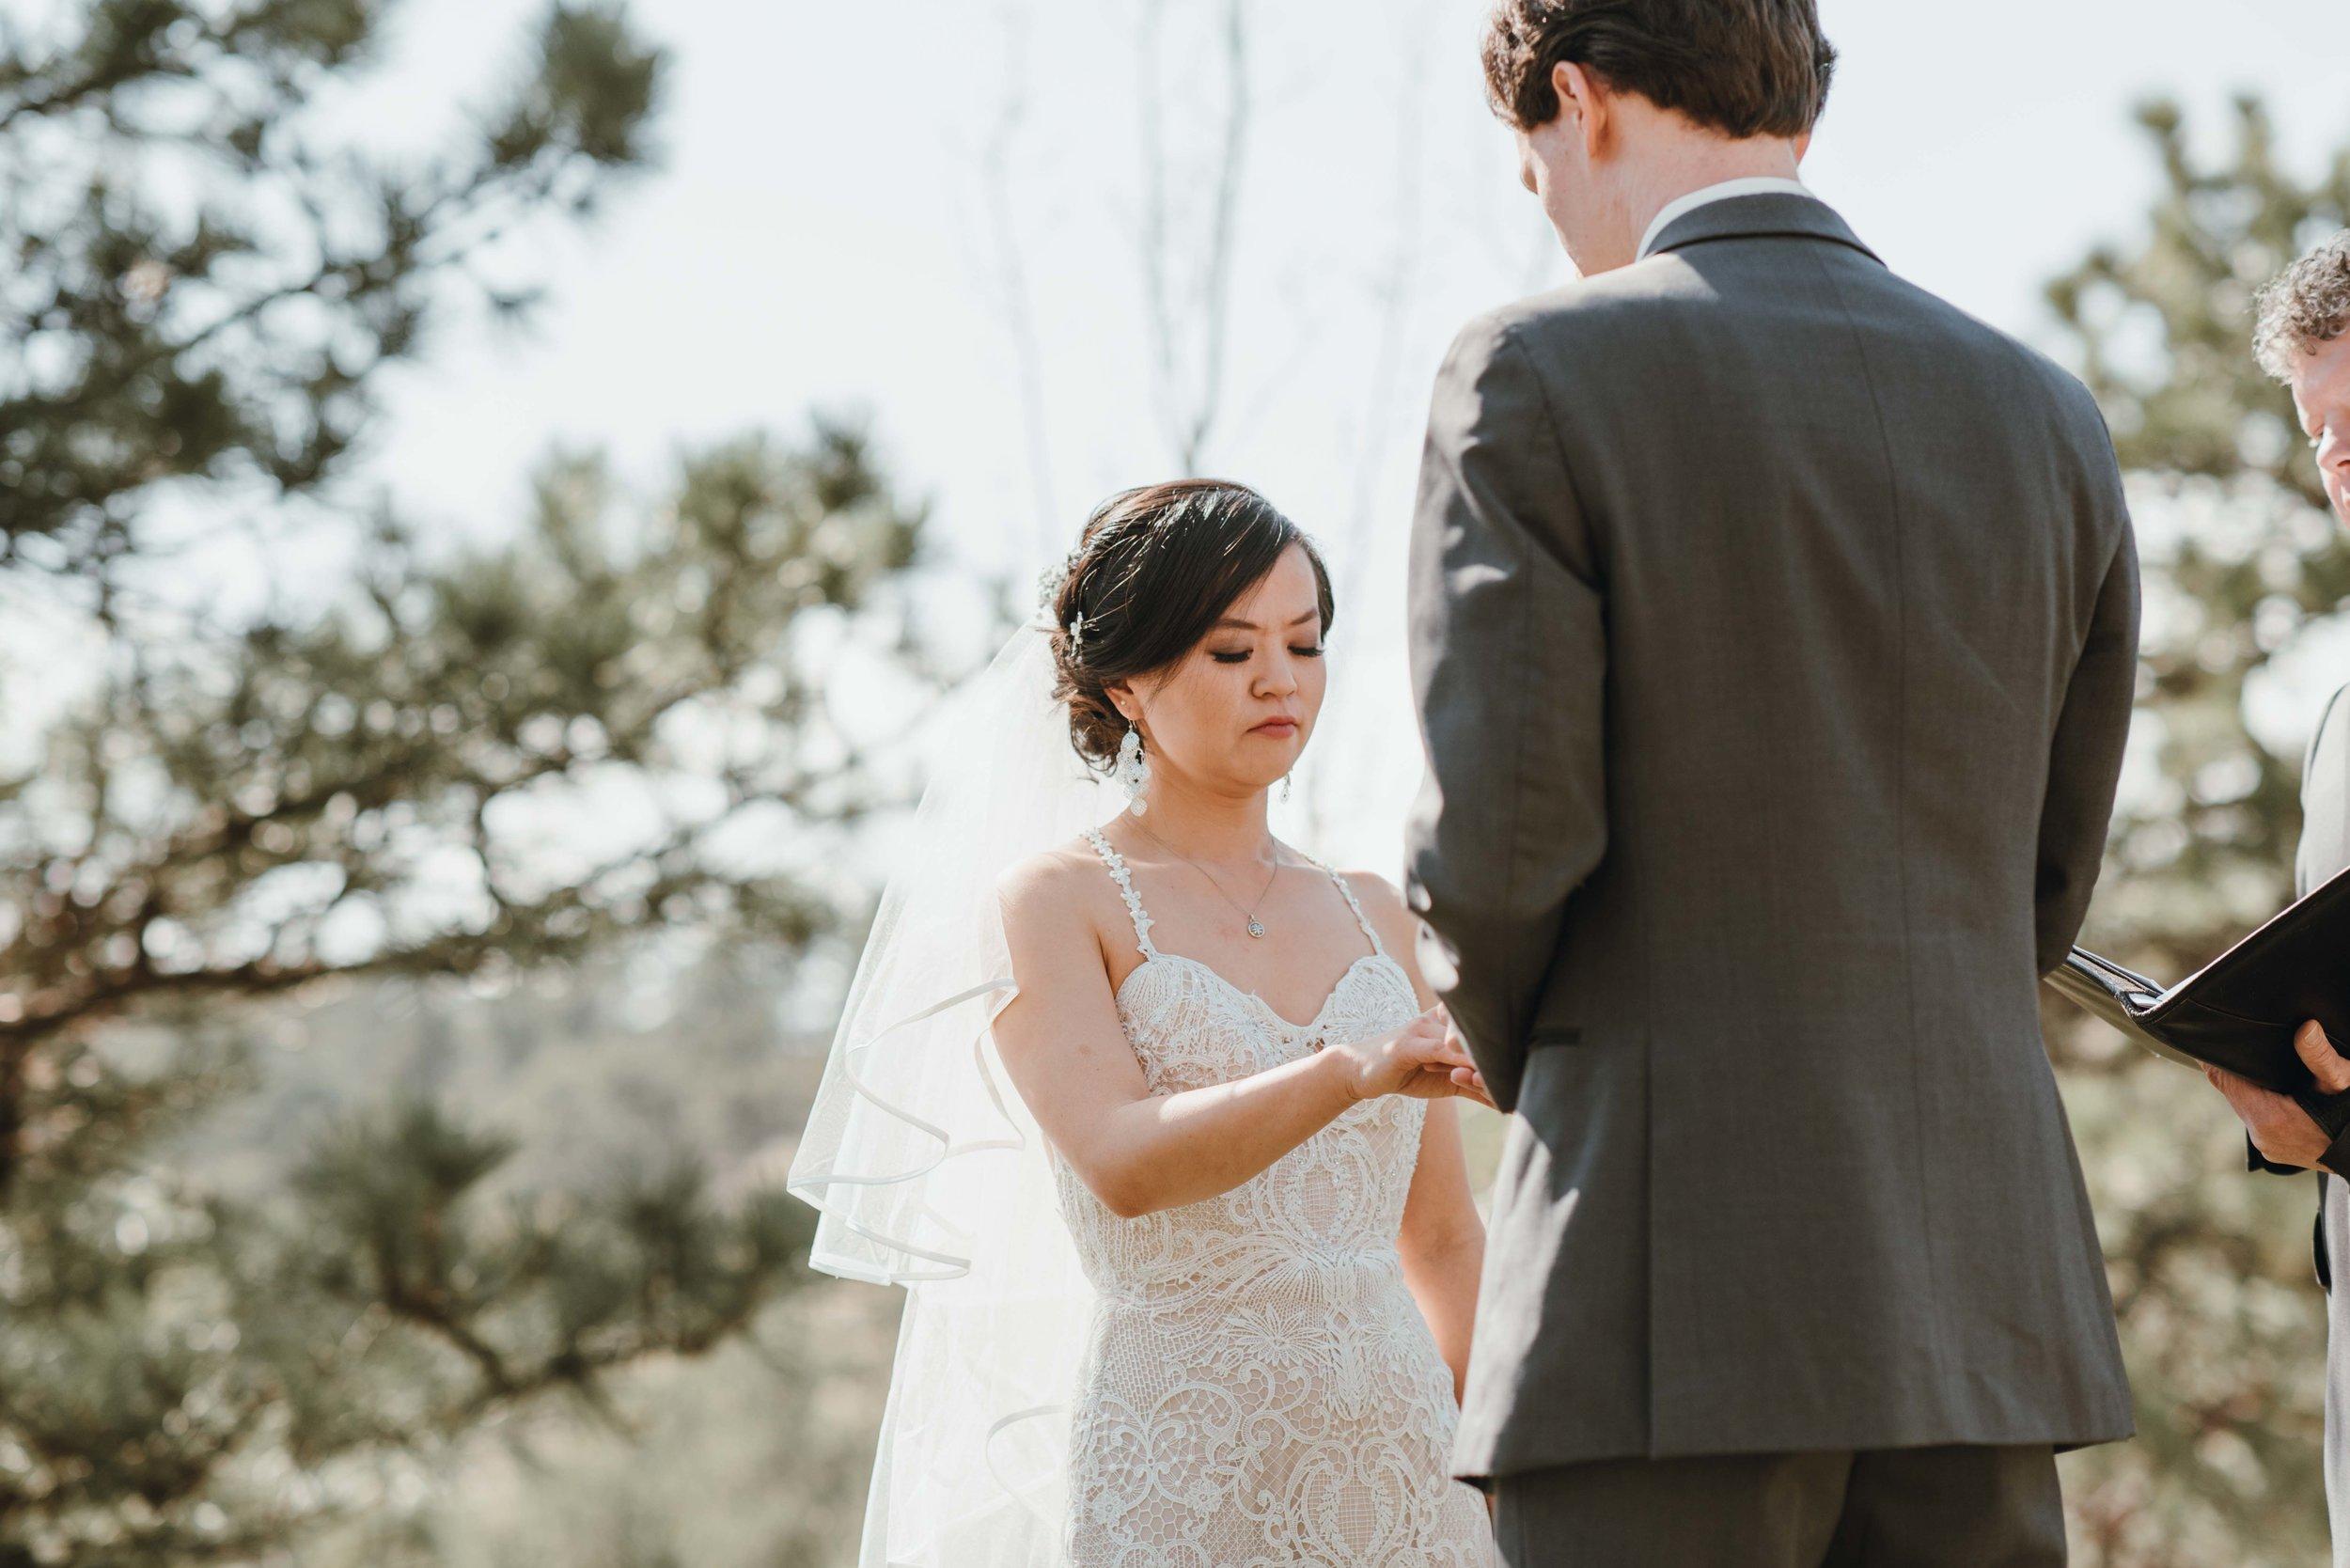 denver wedding photographer lioncrest manor in lyons ben and mali -DSC_1618.jpg